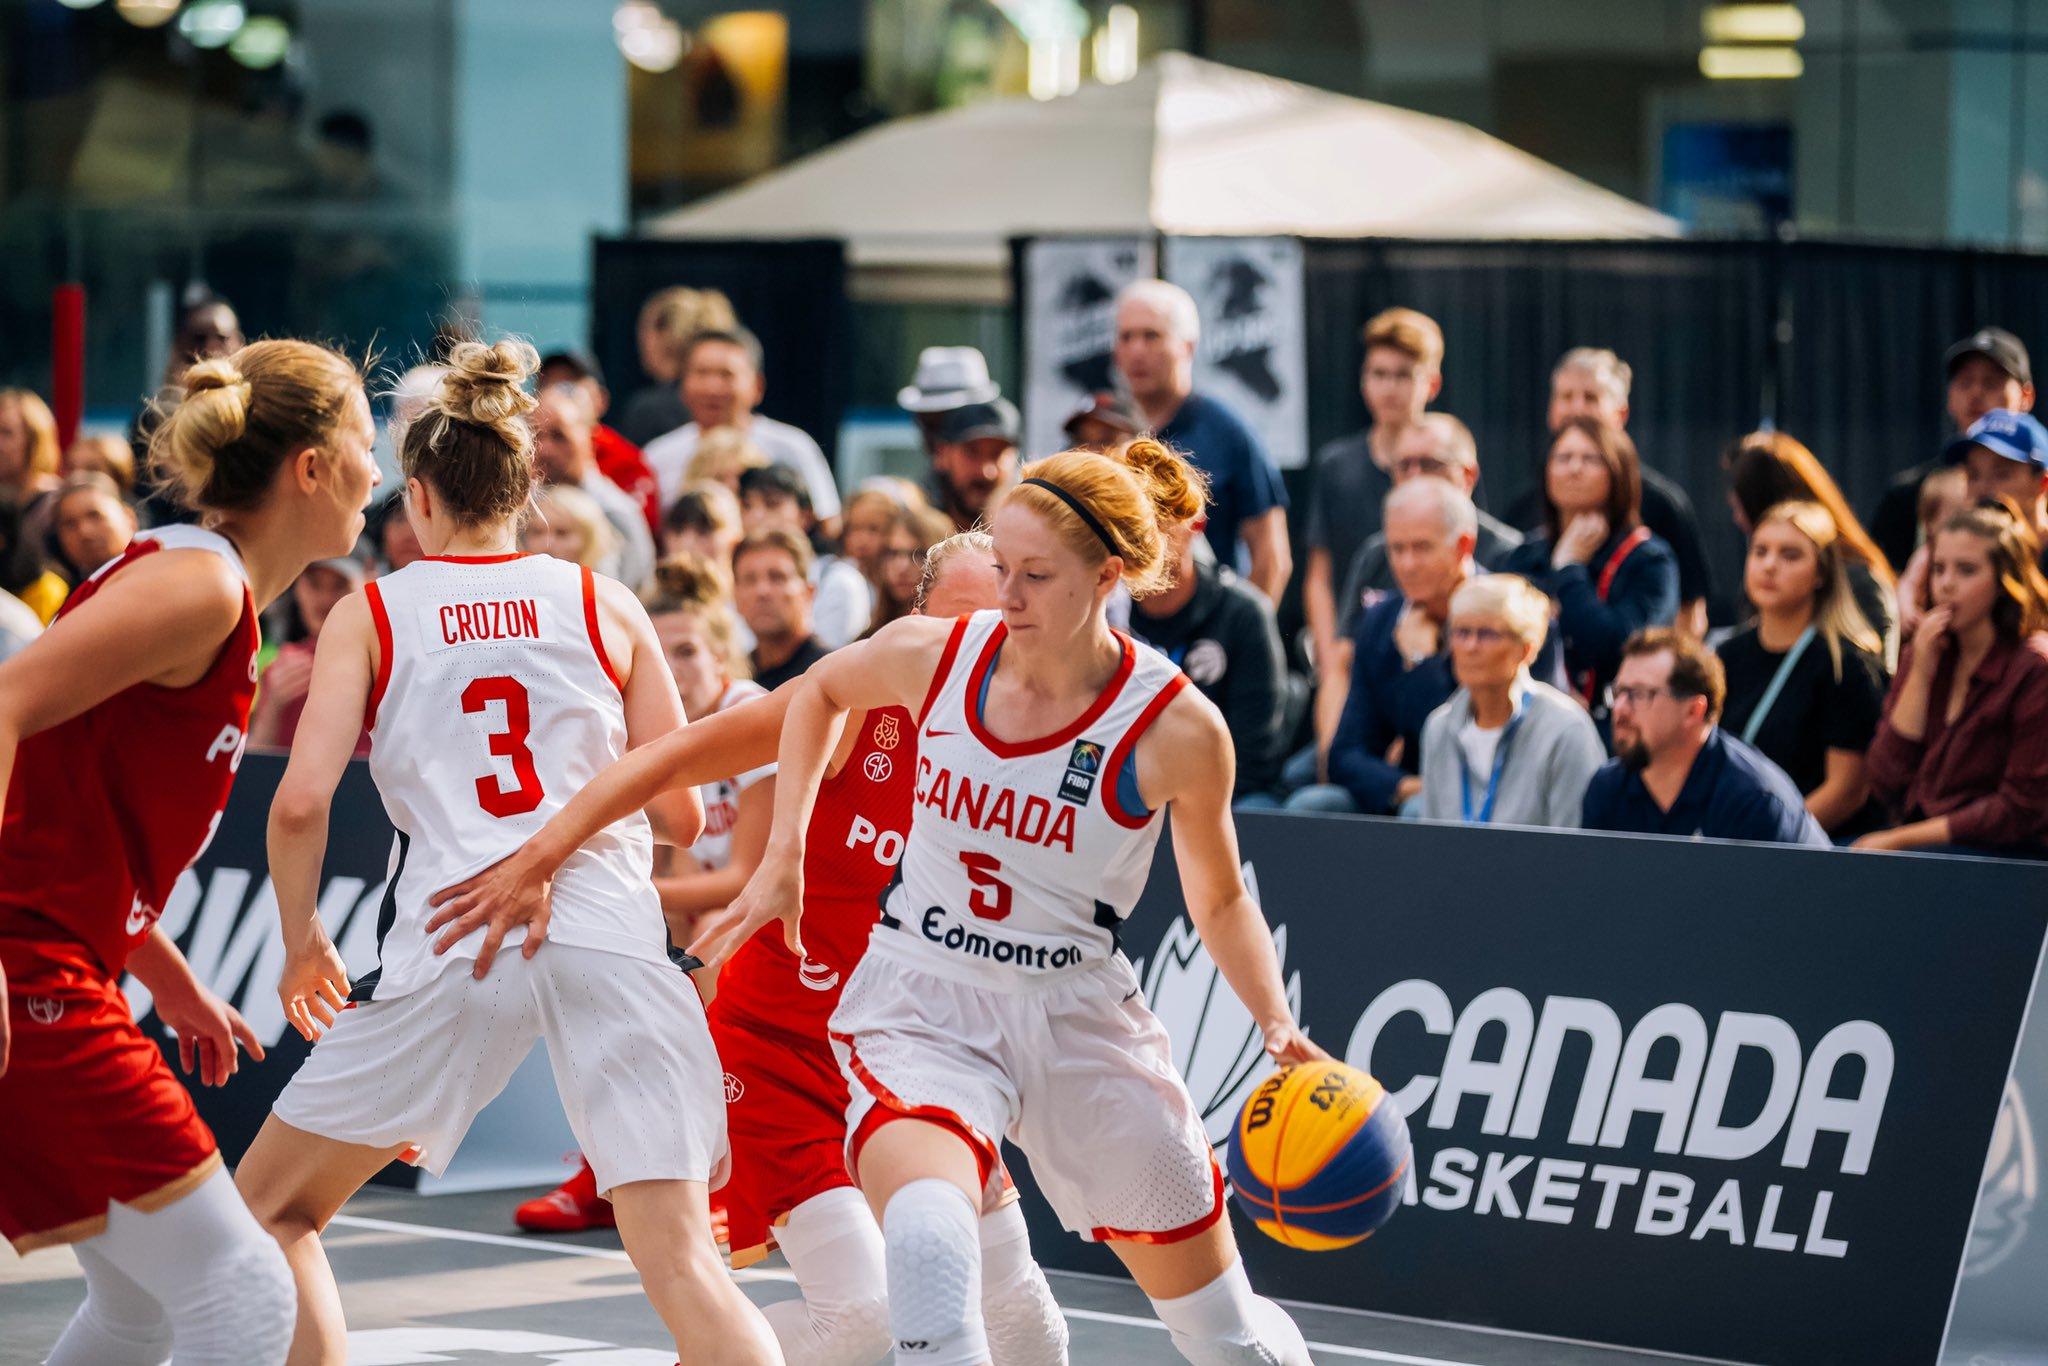 3x3 women's basketball game